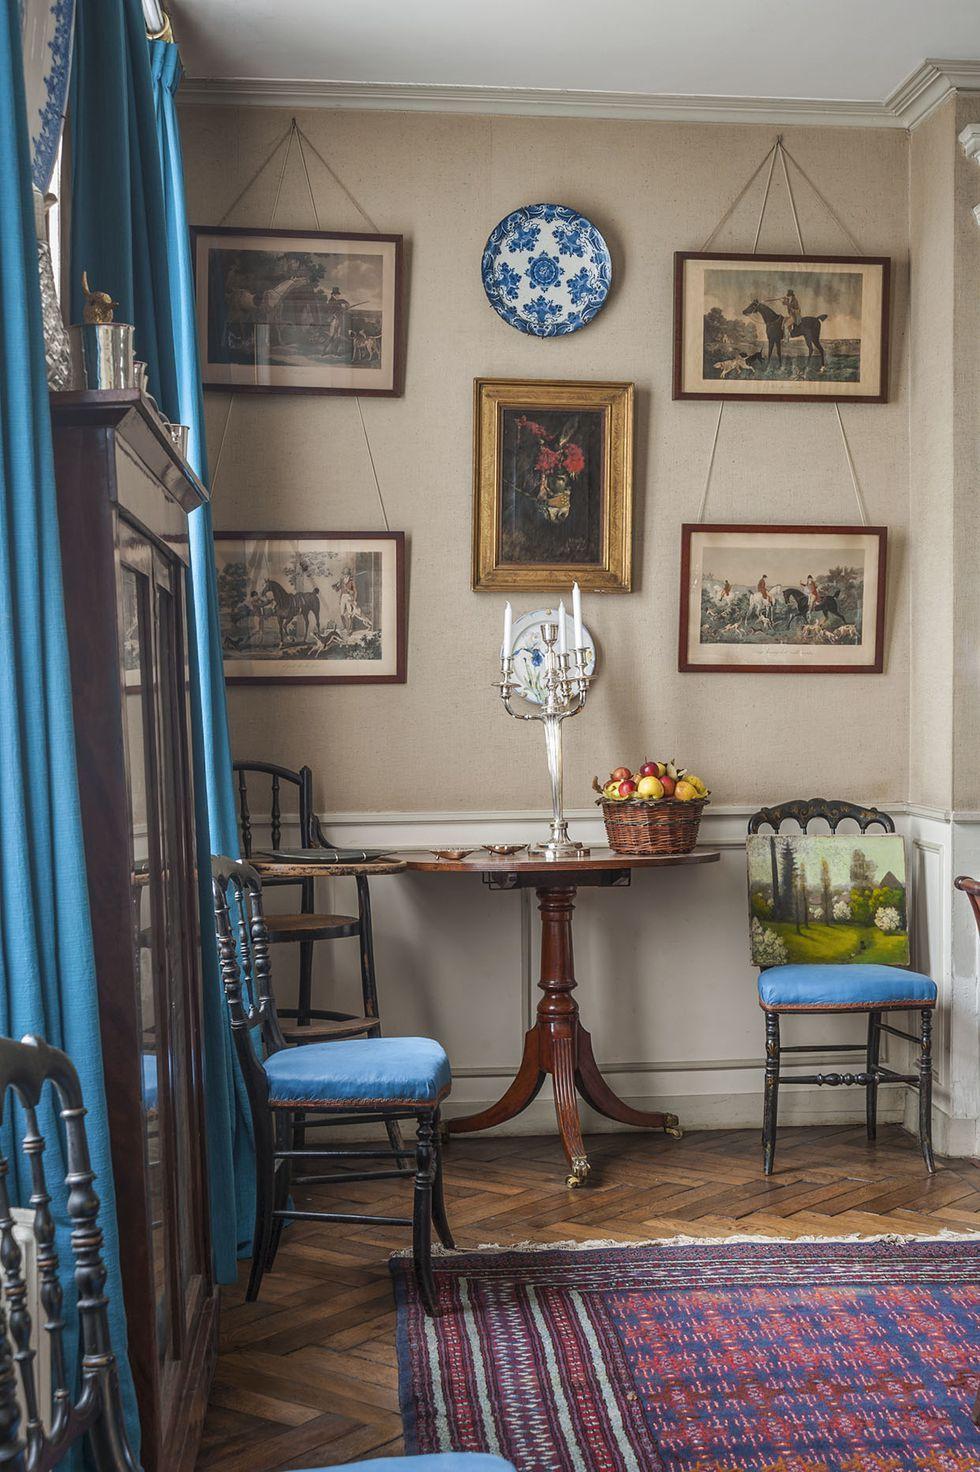 25 Best Living Room Curtain Ideas 2020 | Dining room ...